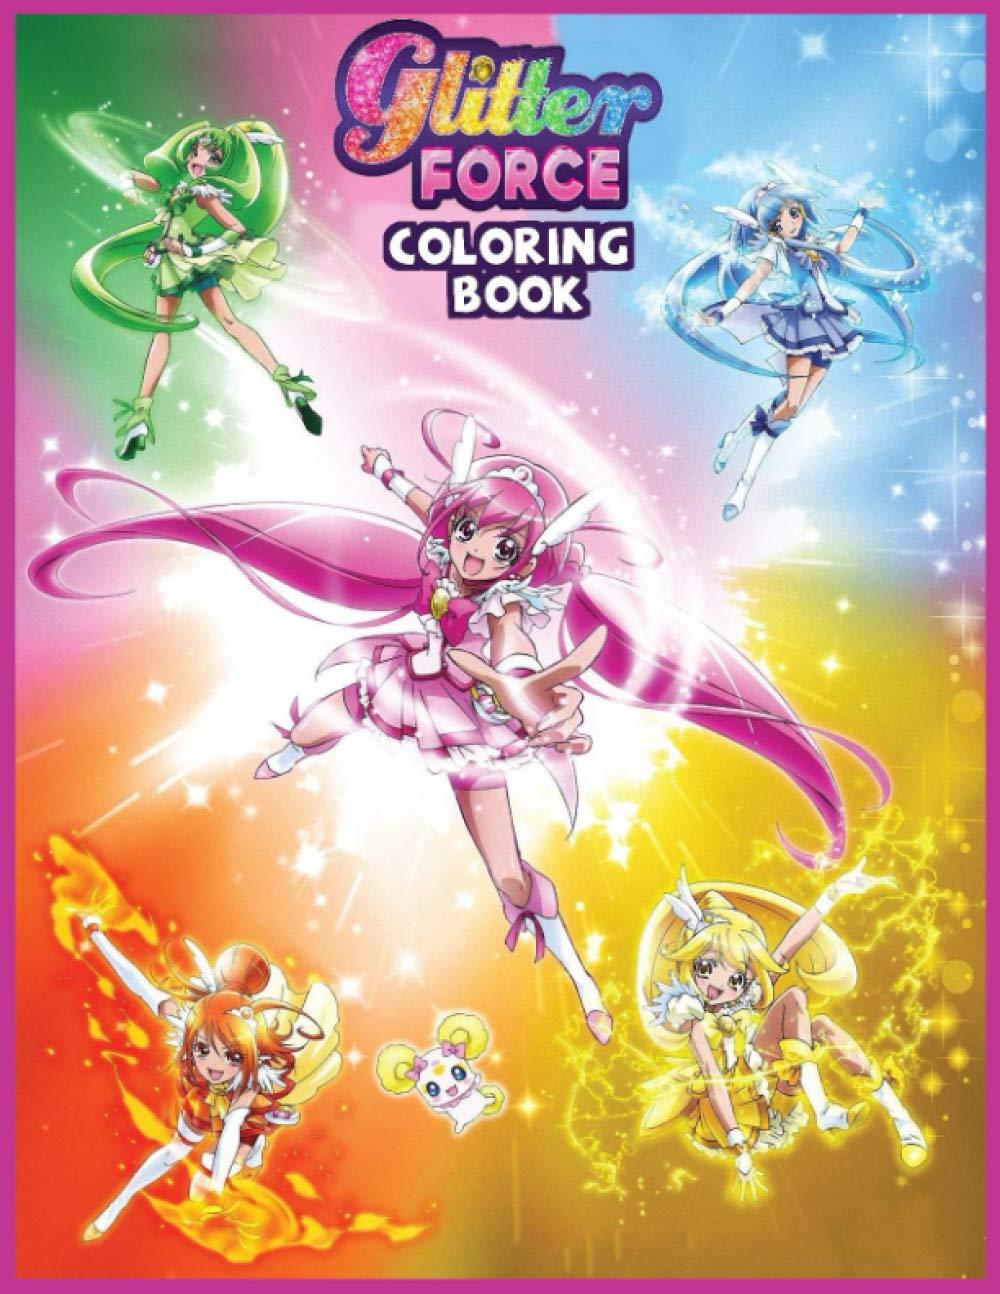 Glitter Force Coloring Book Ã'¹ãƒžã'¤ãƒ«ãƒ—リキュア Smile Precure Smile Pretty Cure Sumairu Purikyua Hazal Elias Saba 9798563807082 Amazon Com Books